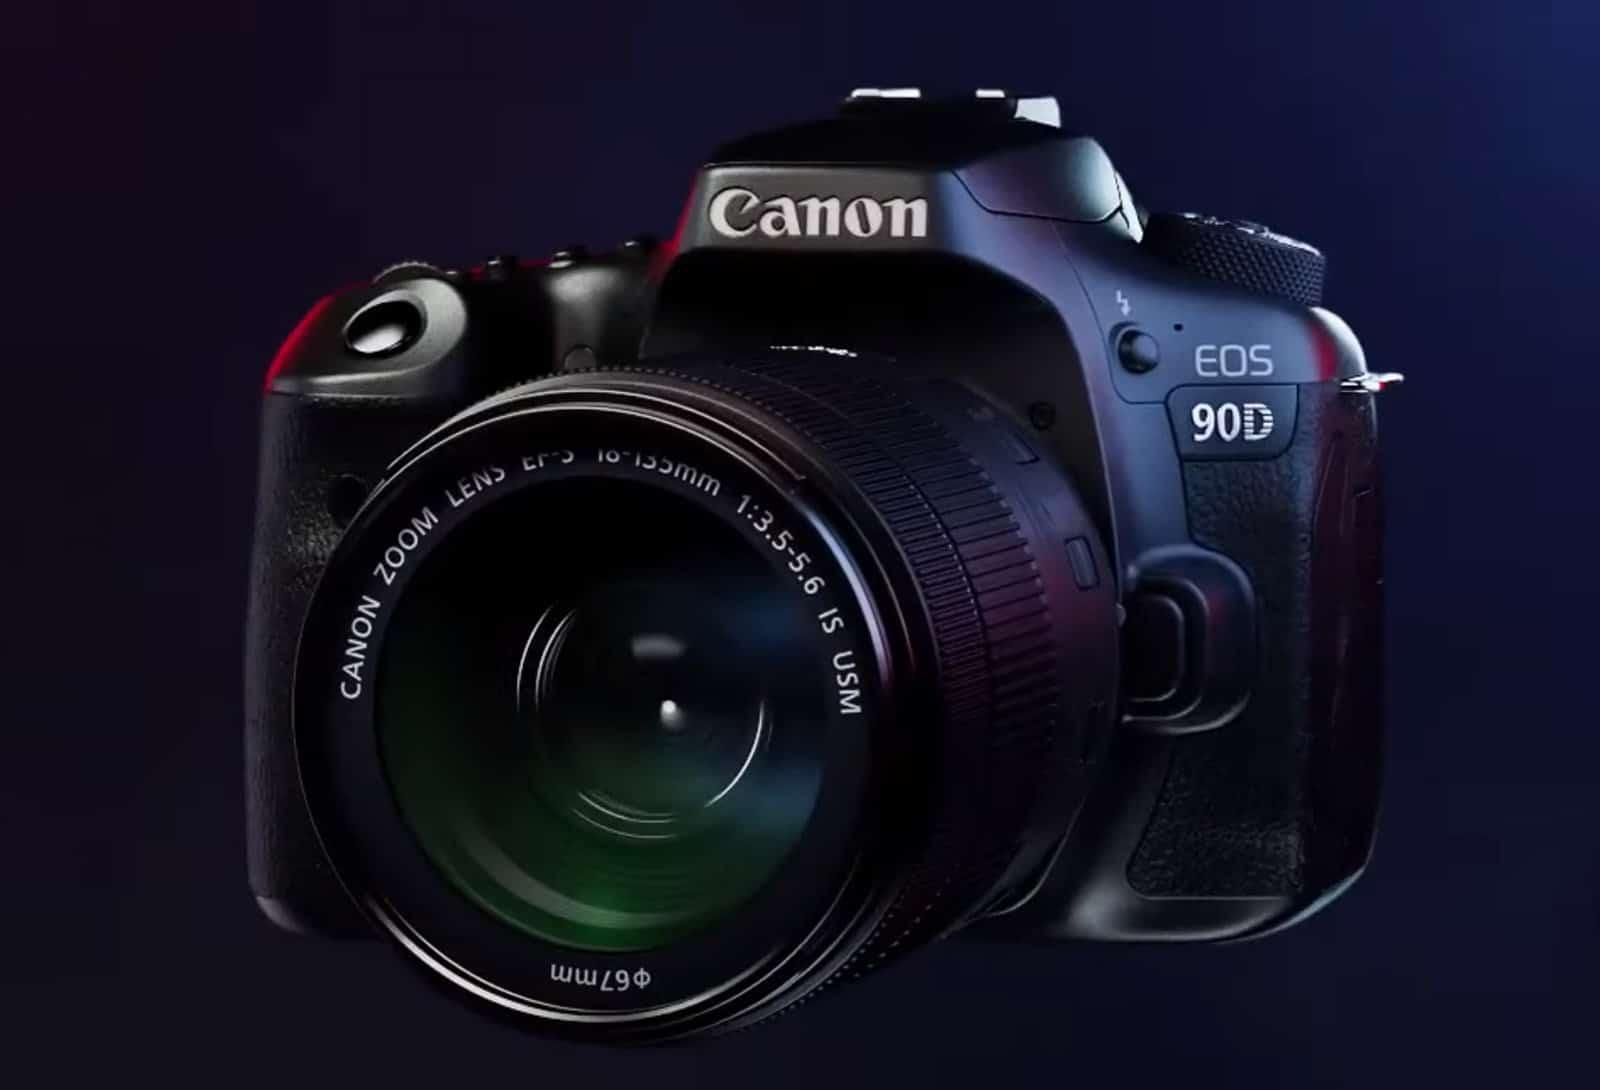 Camera News: Canon EOS 90D to feature 32 5MP sensor, 4K